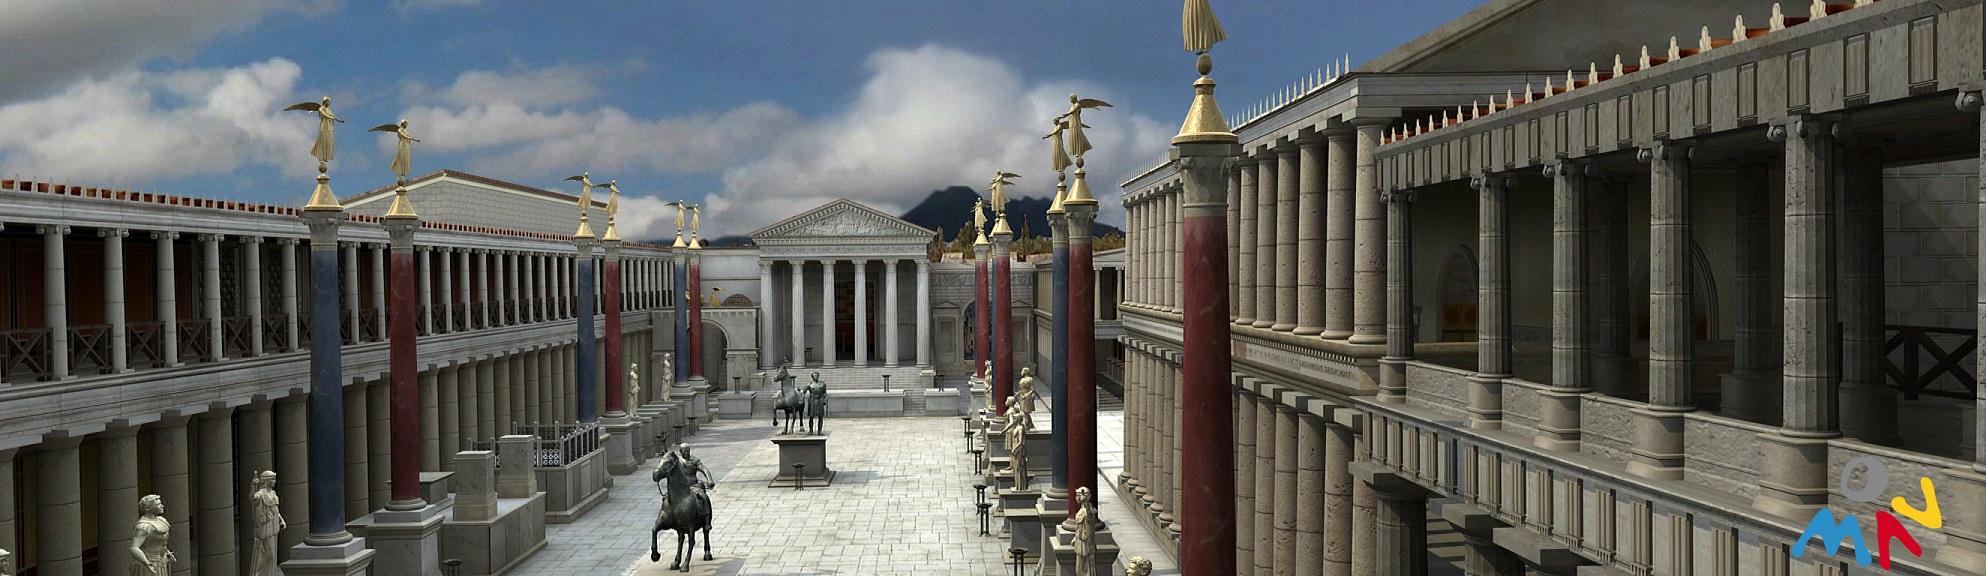 Pompei foro 1jpg